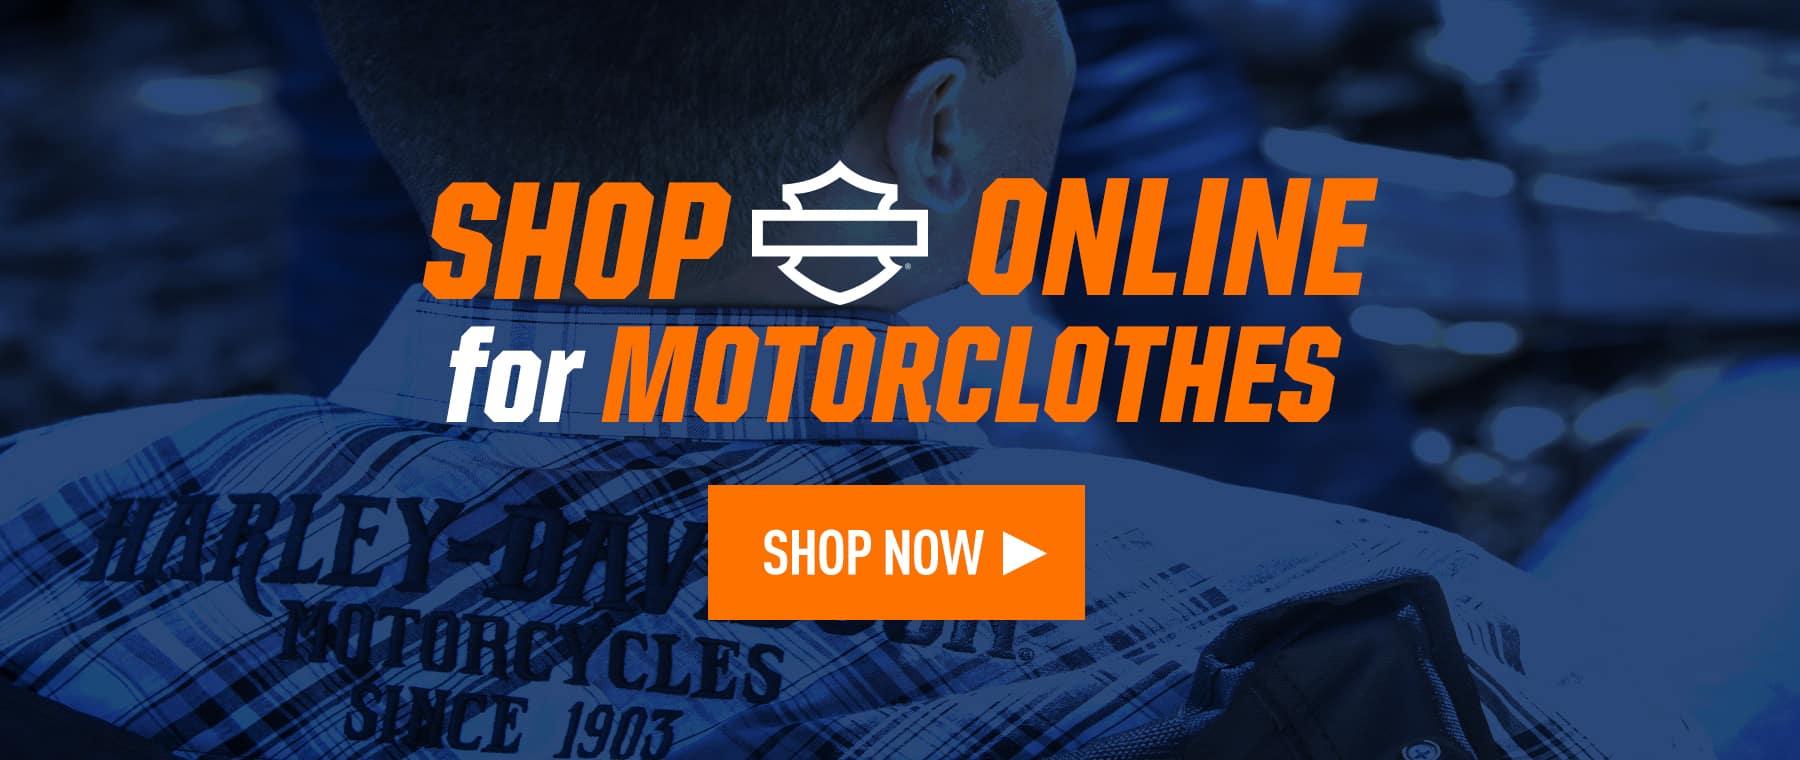 shop-online-wbhp-shop-banner copy